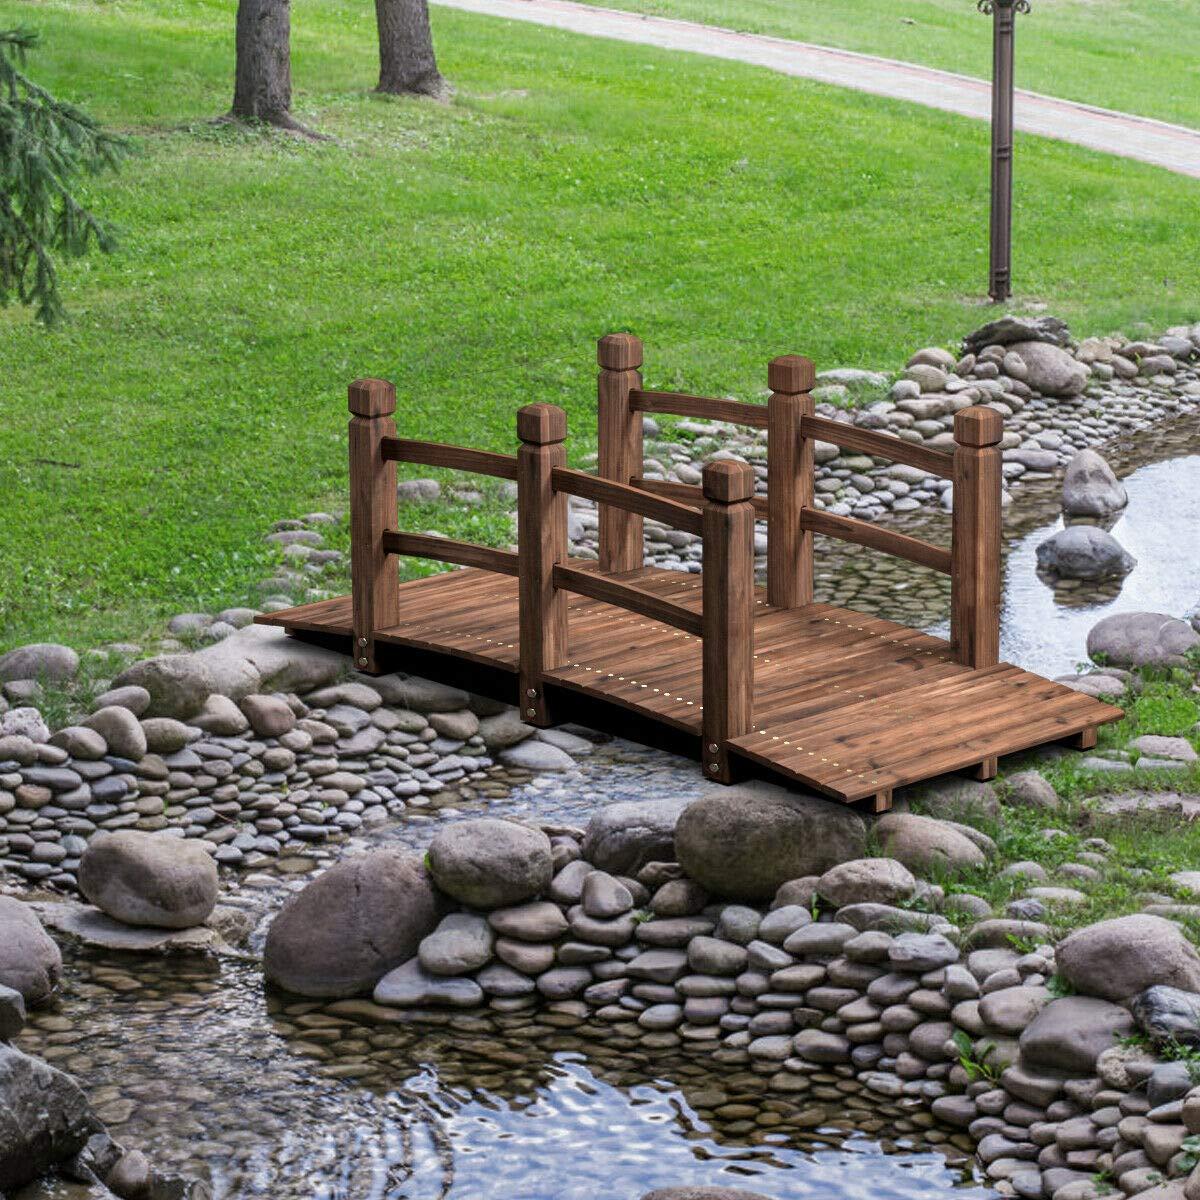 Alek...Shop Outdoor Garden Decor Bridge Wooden 5 Ft Decorative Pond Bridge Arch Backyard Walkway w/Railings, Brown